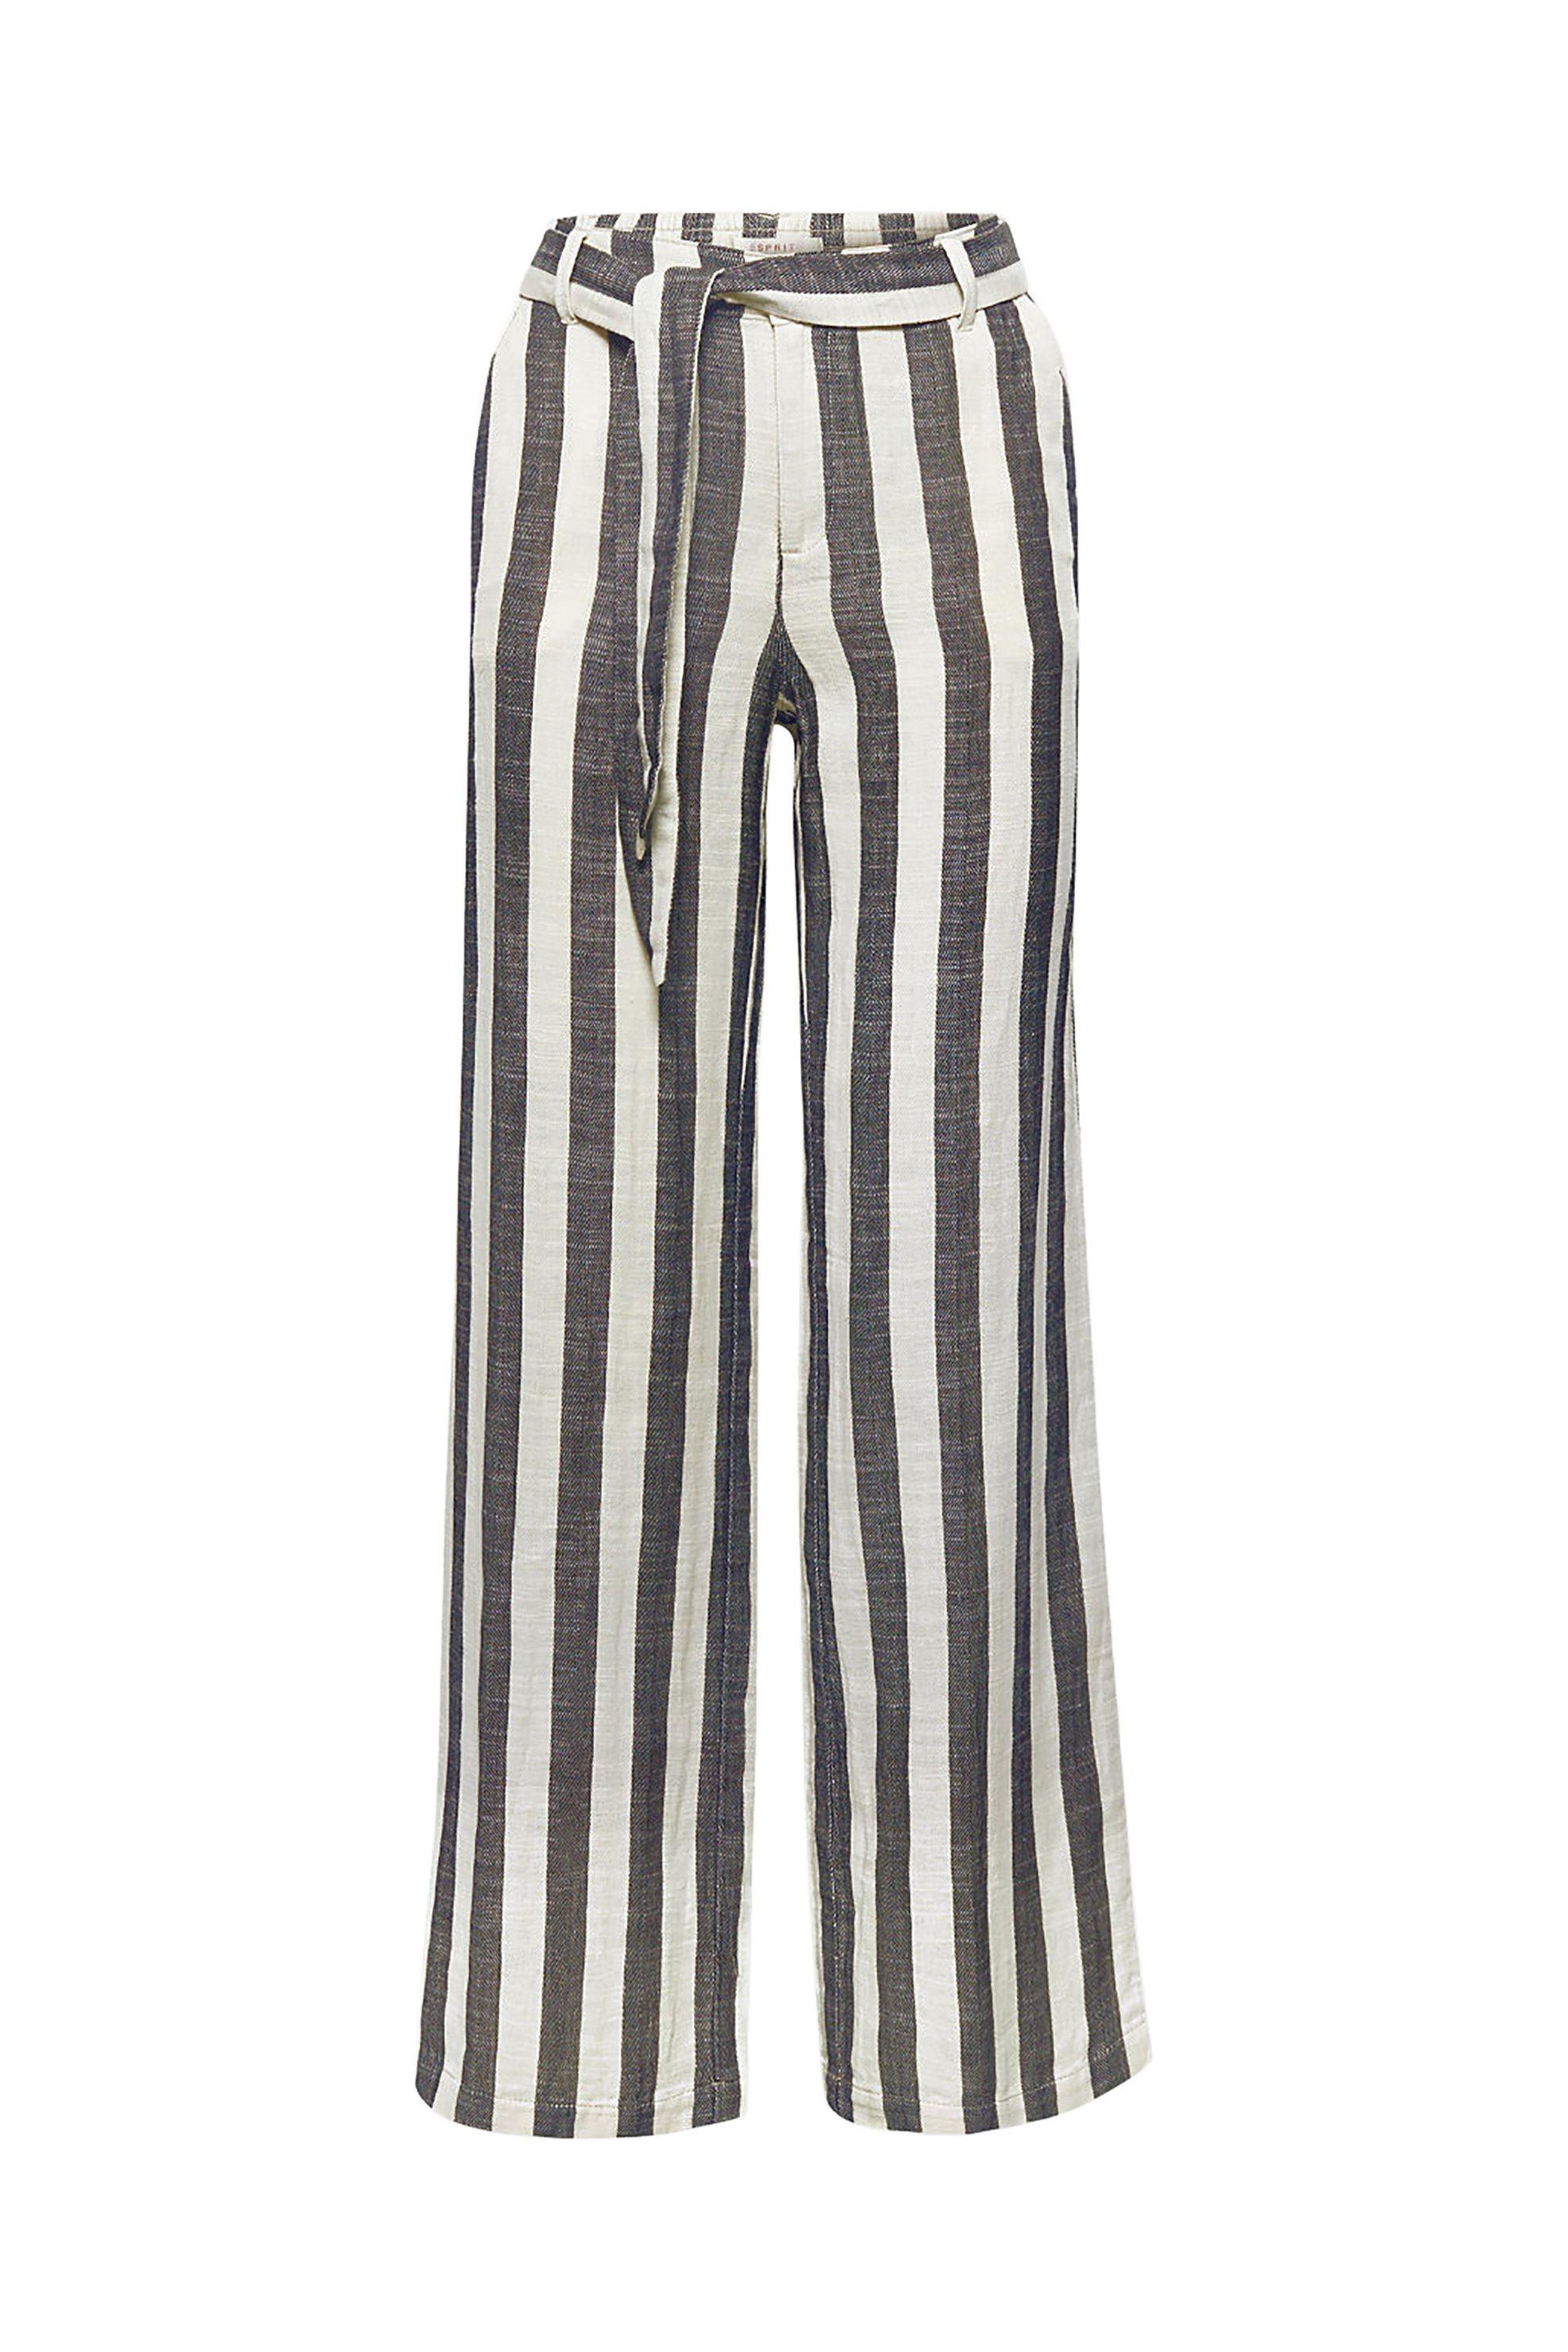 8d46ad8c33ed Esprit γυναικείο ριγέ παντελόνι λινό - 078EE1B006 - Λευκό